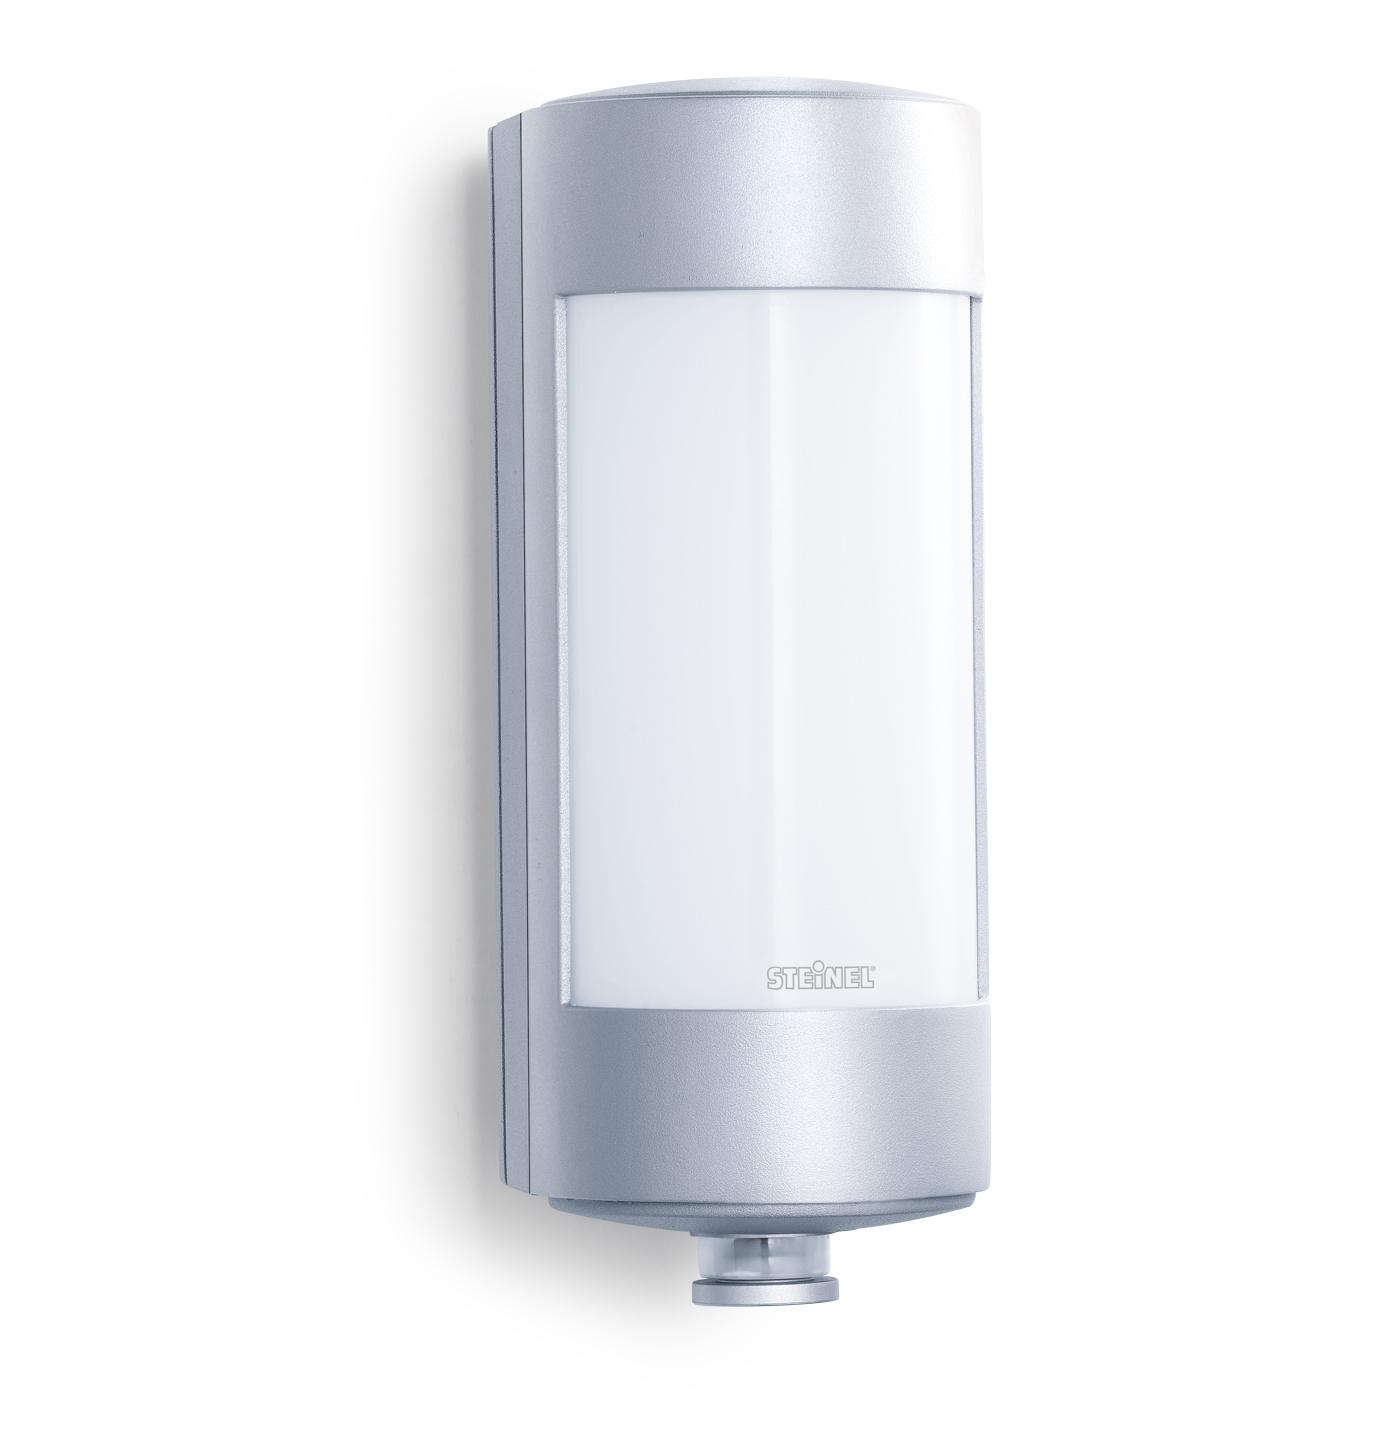 Steinel sensorleuchte l 271 s aluminium 647919 for Hausfronten modern